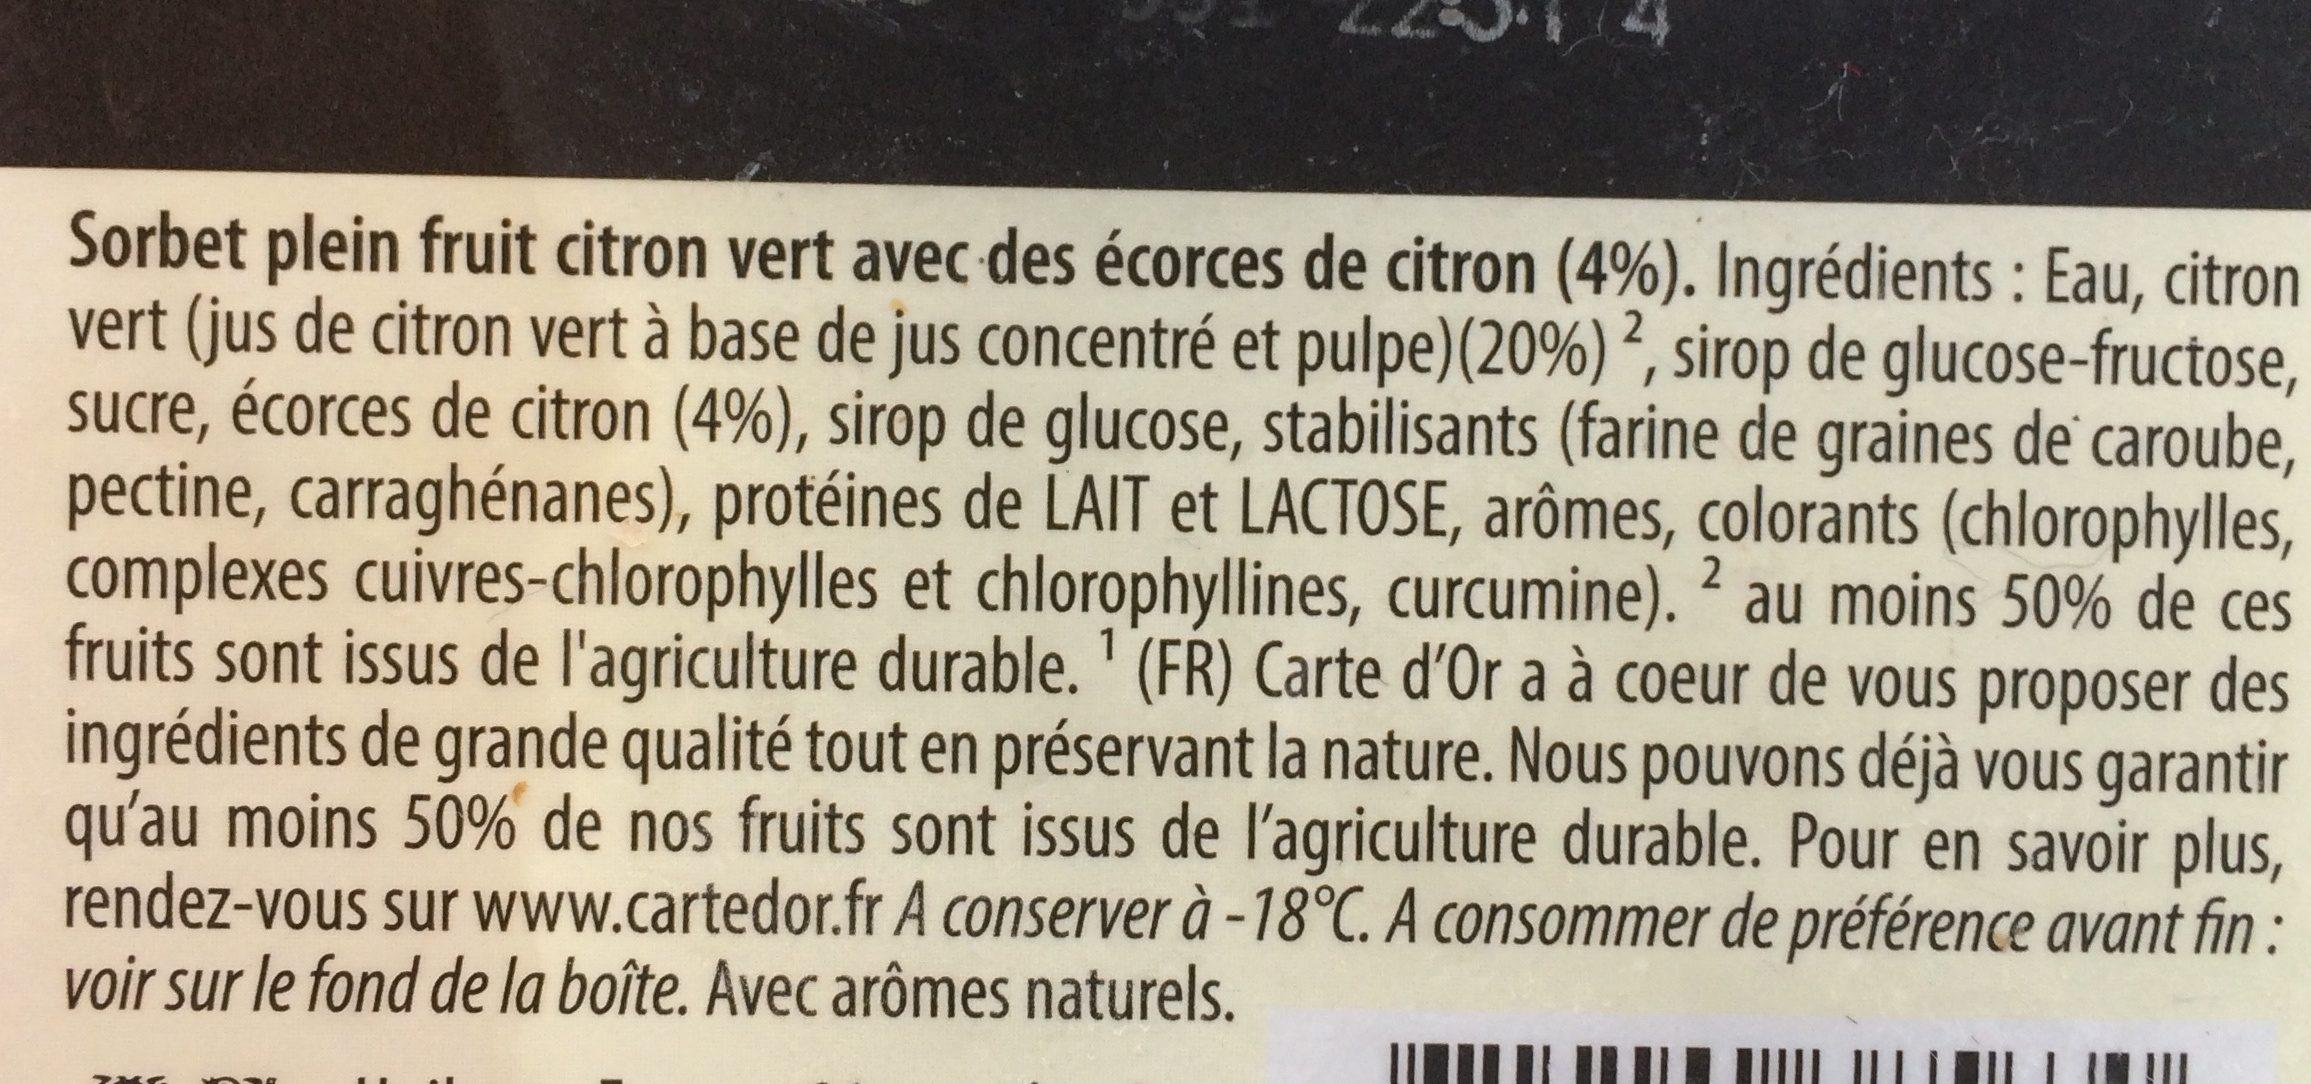 Carte D'or Sorbet Plein Fruit Citron Vert 1000ml - Ingredienti - fr